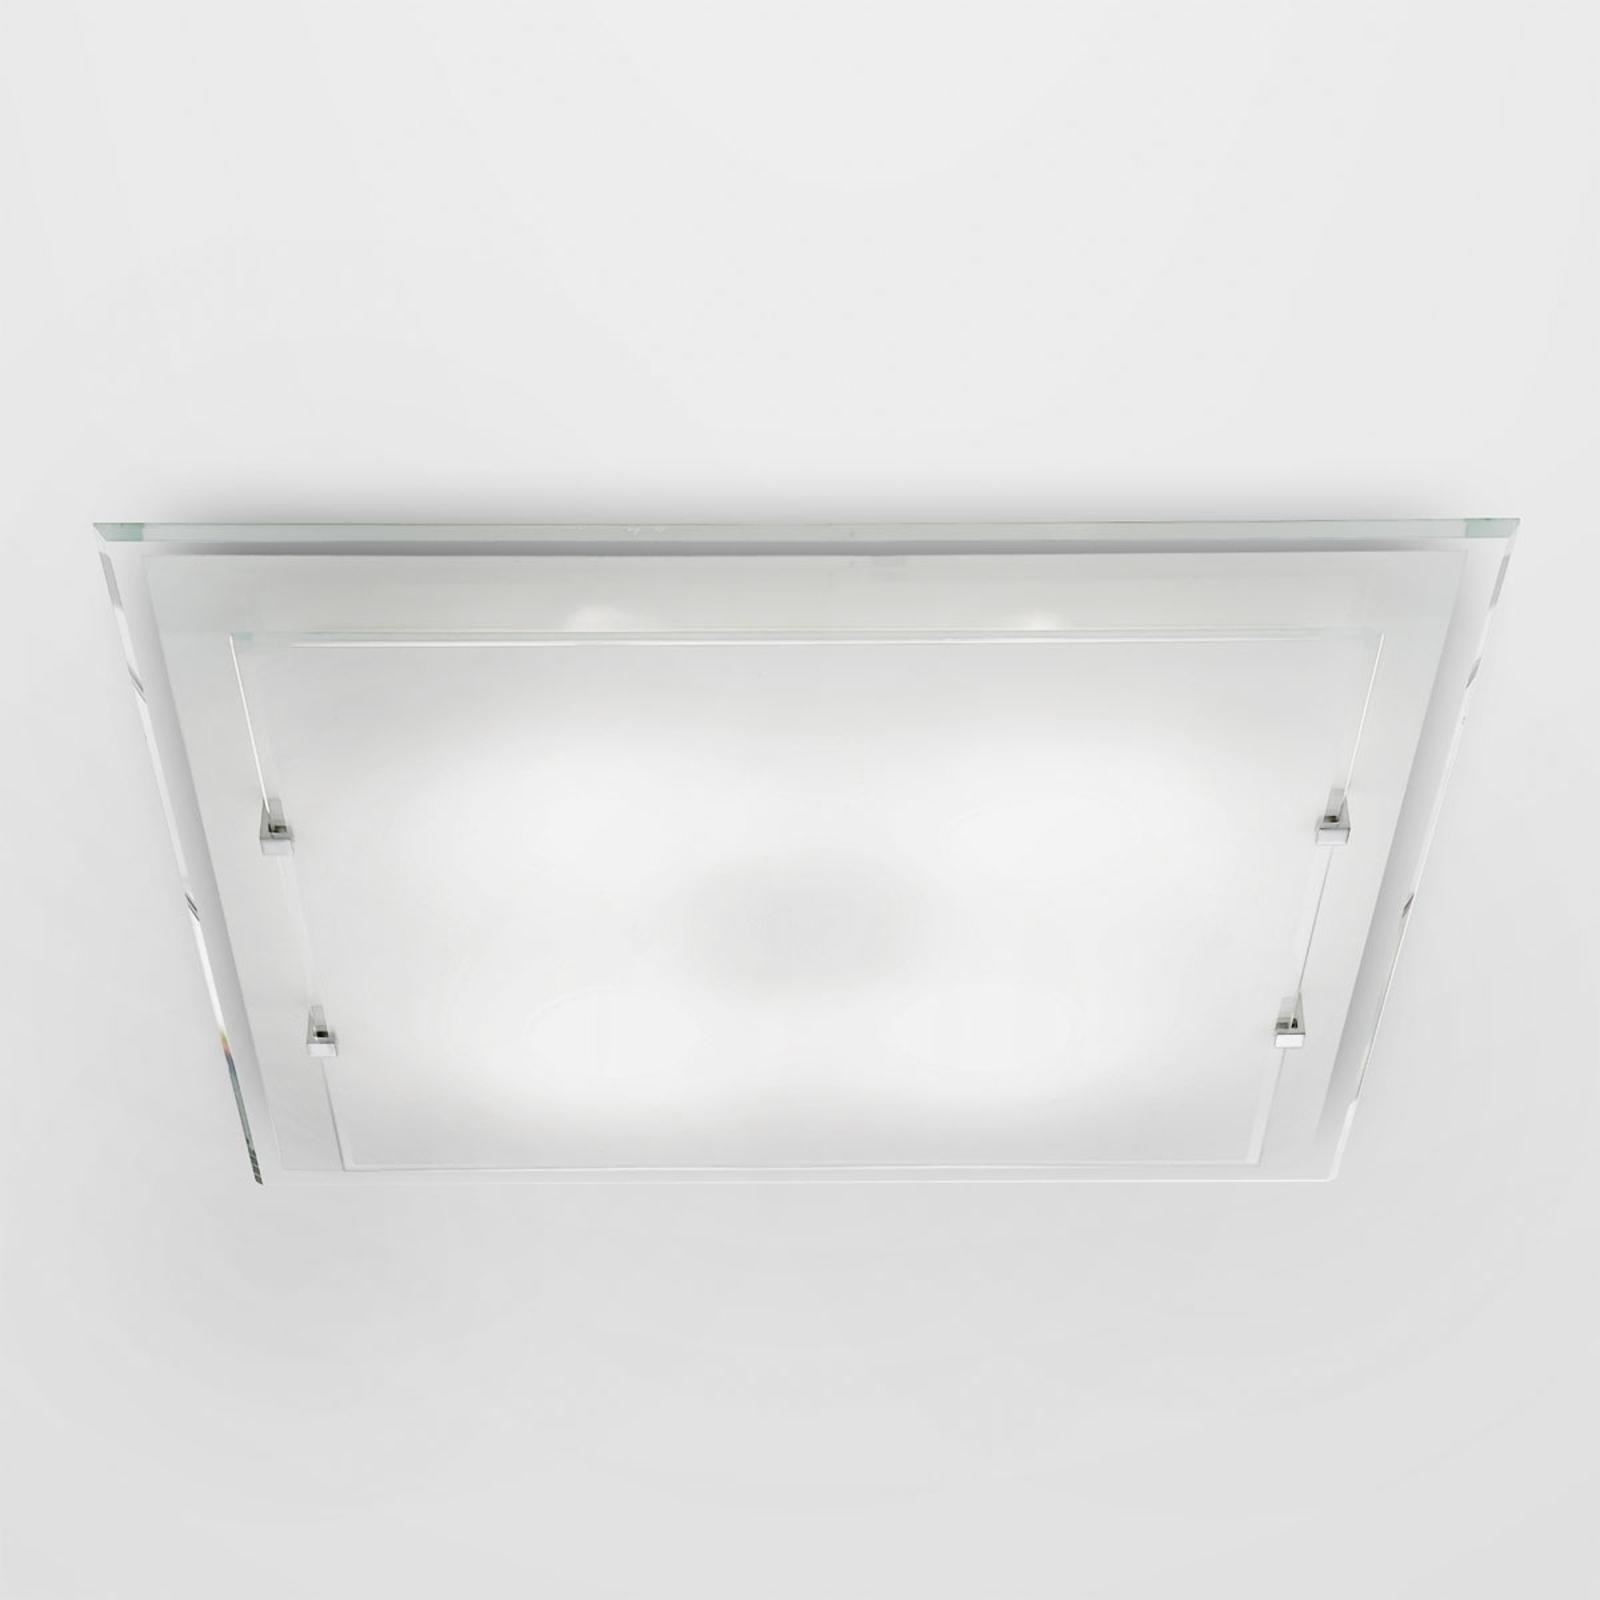 Kanciasta lampa sufitowa Victoria, 40 cm x 40 cm